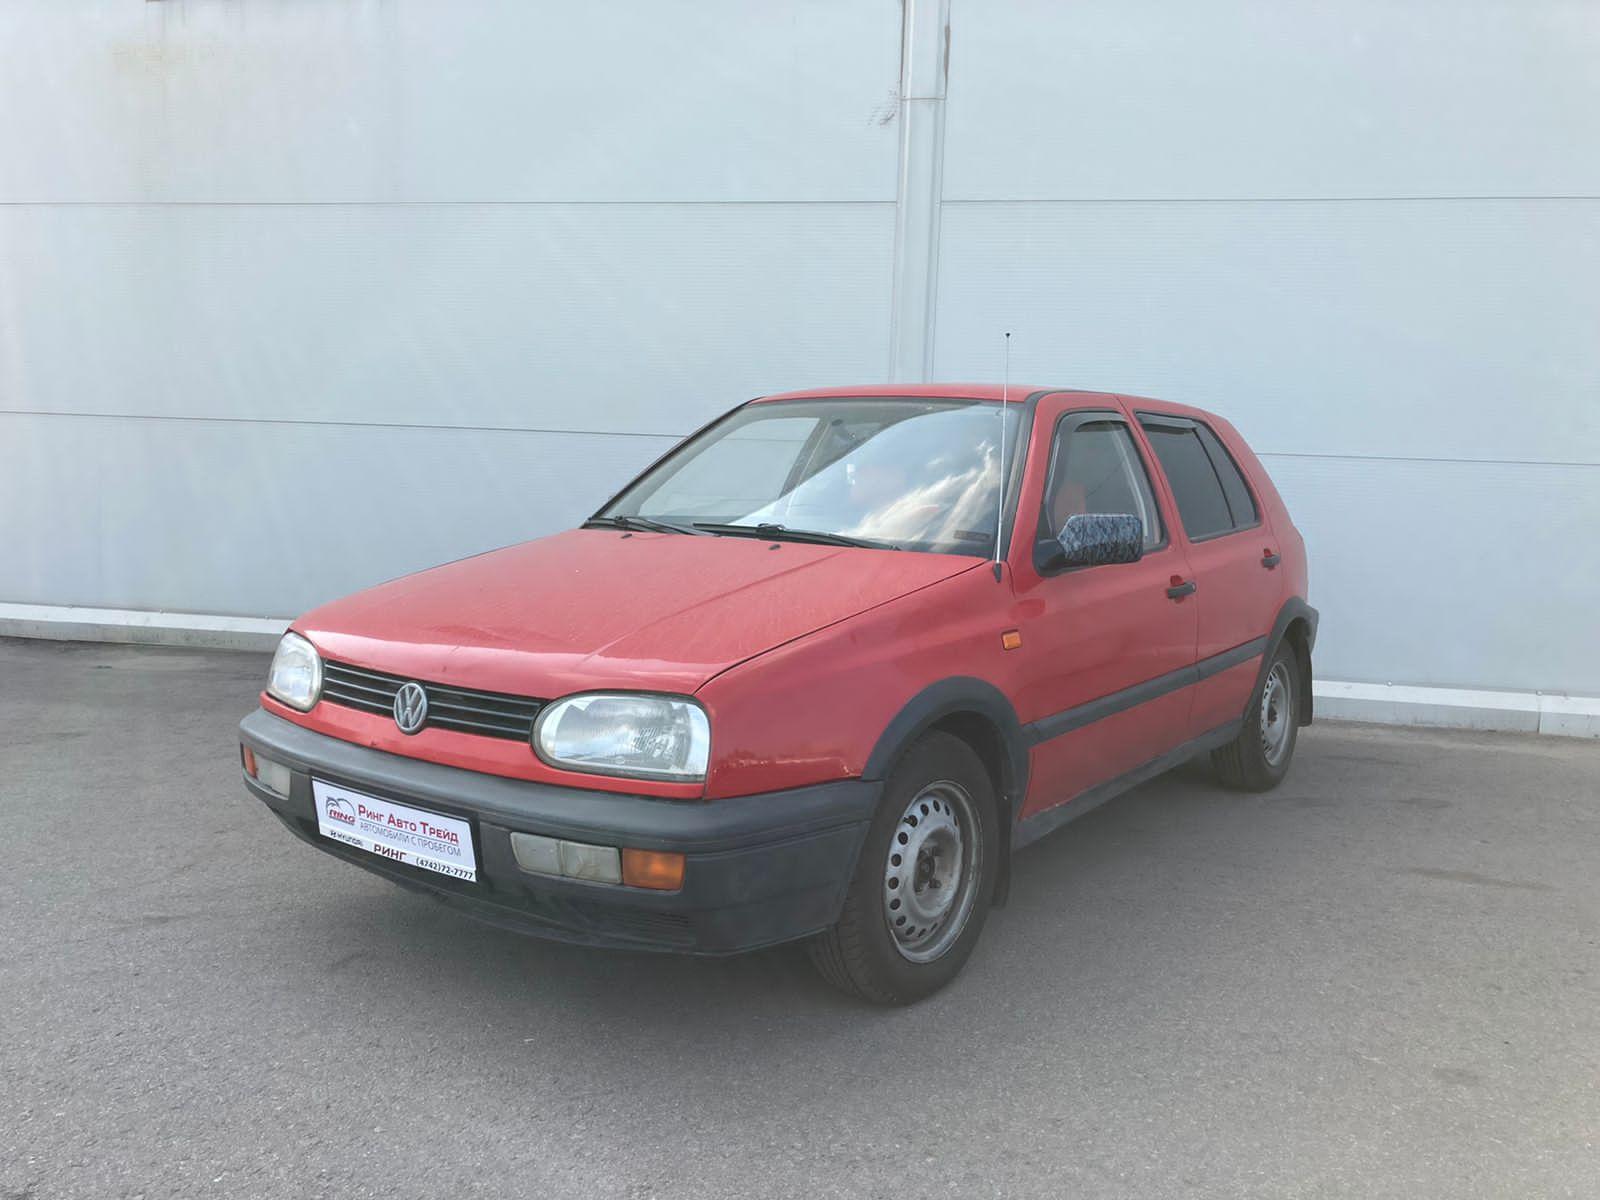 Volkswagen Golf Хэтчбек (1995г.)